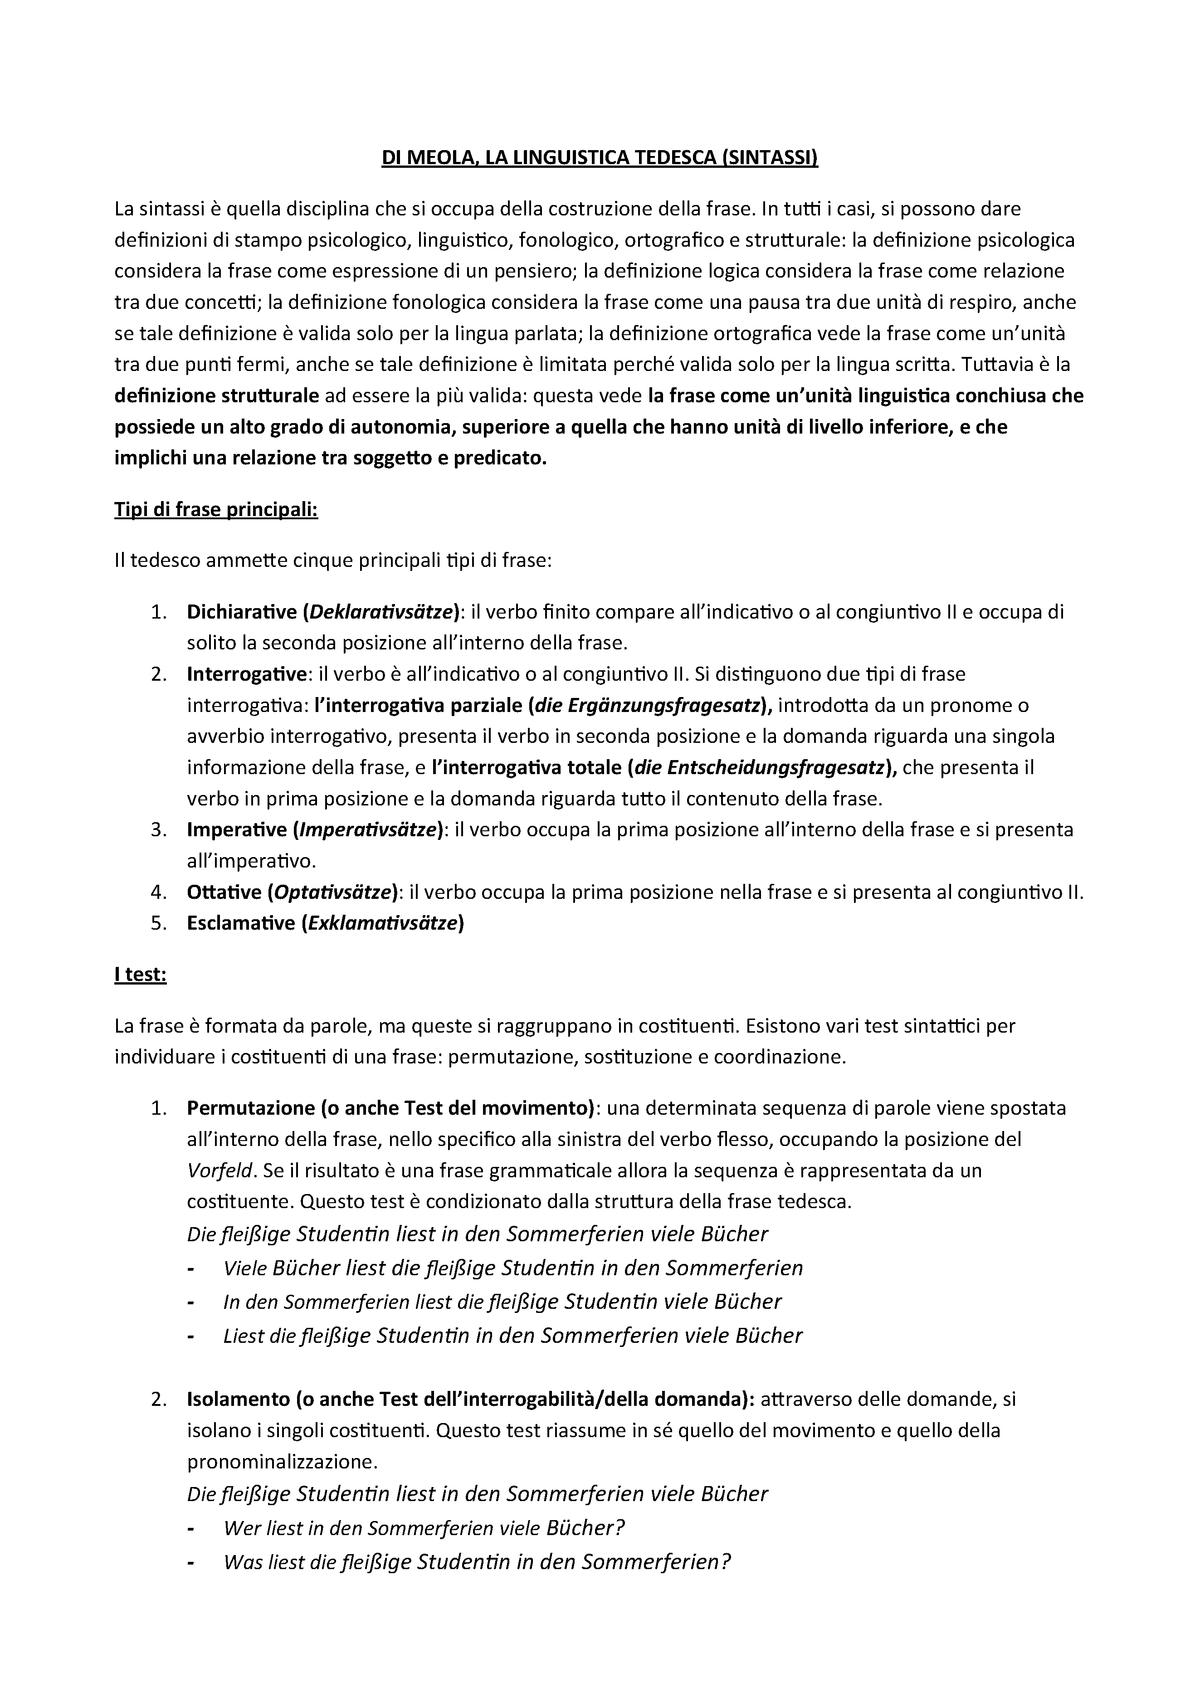 Sintassi Di Meola Riassunto Lingua Tedesca 1 32 17 047